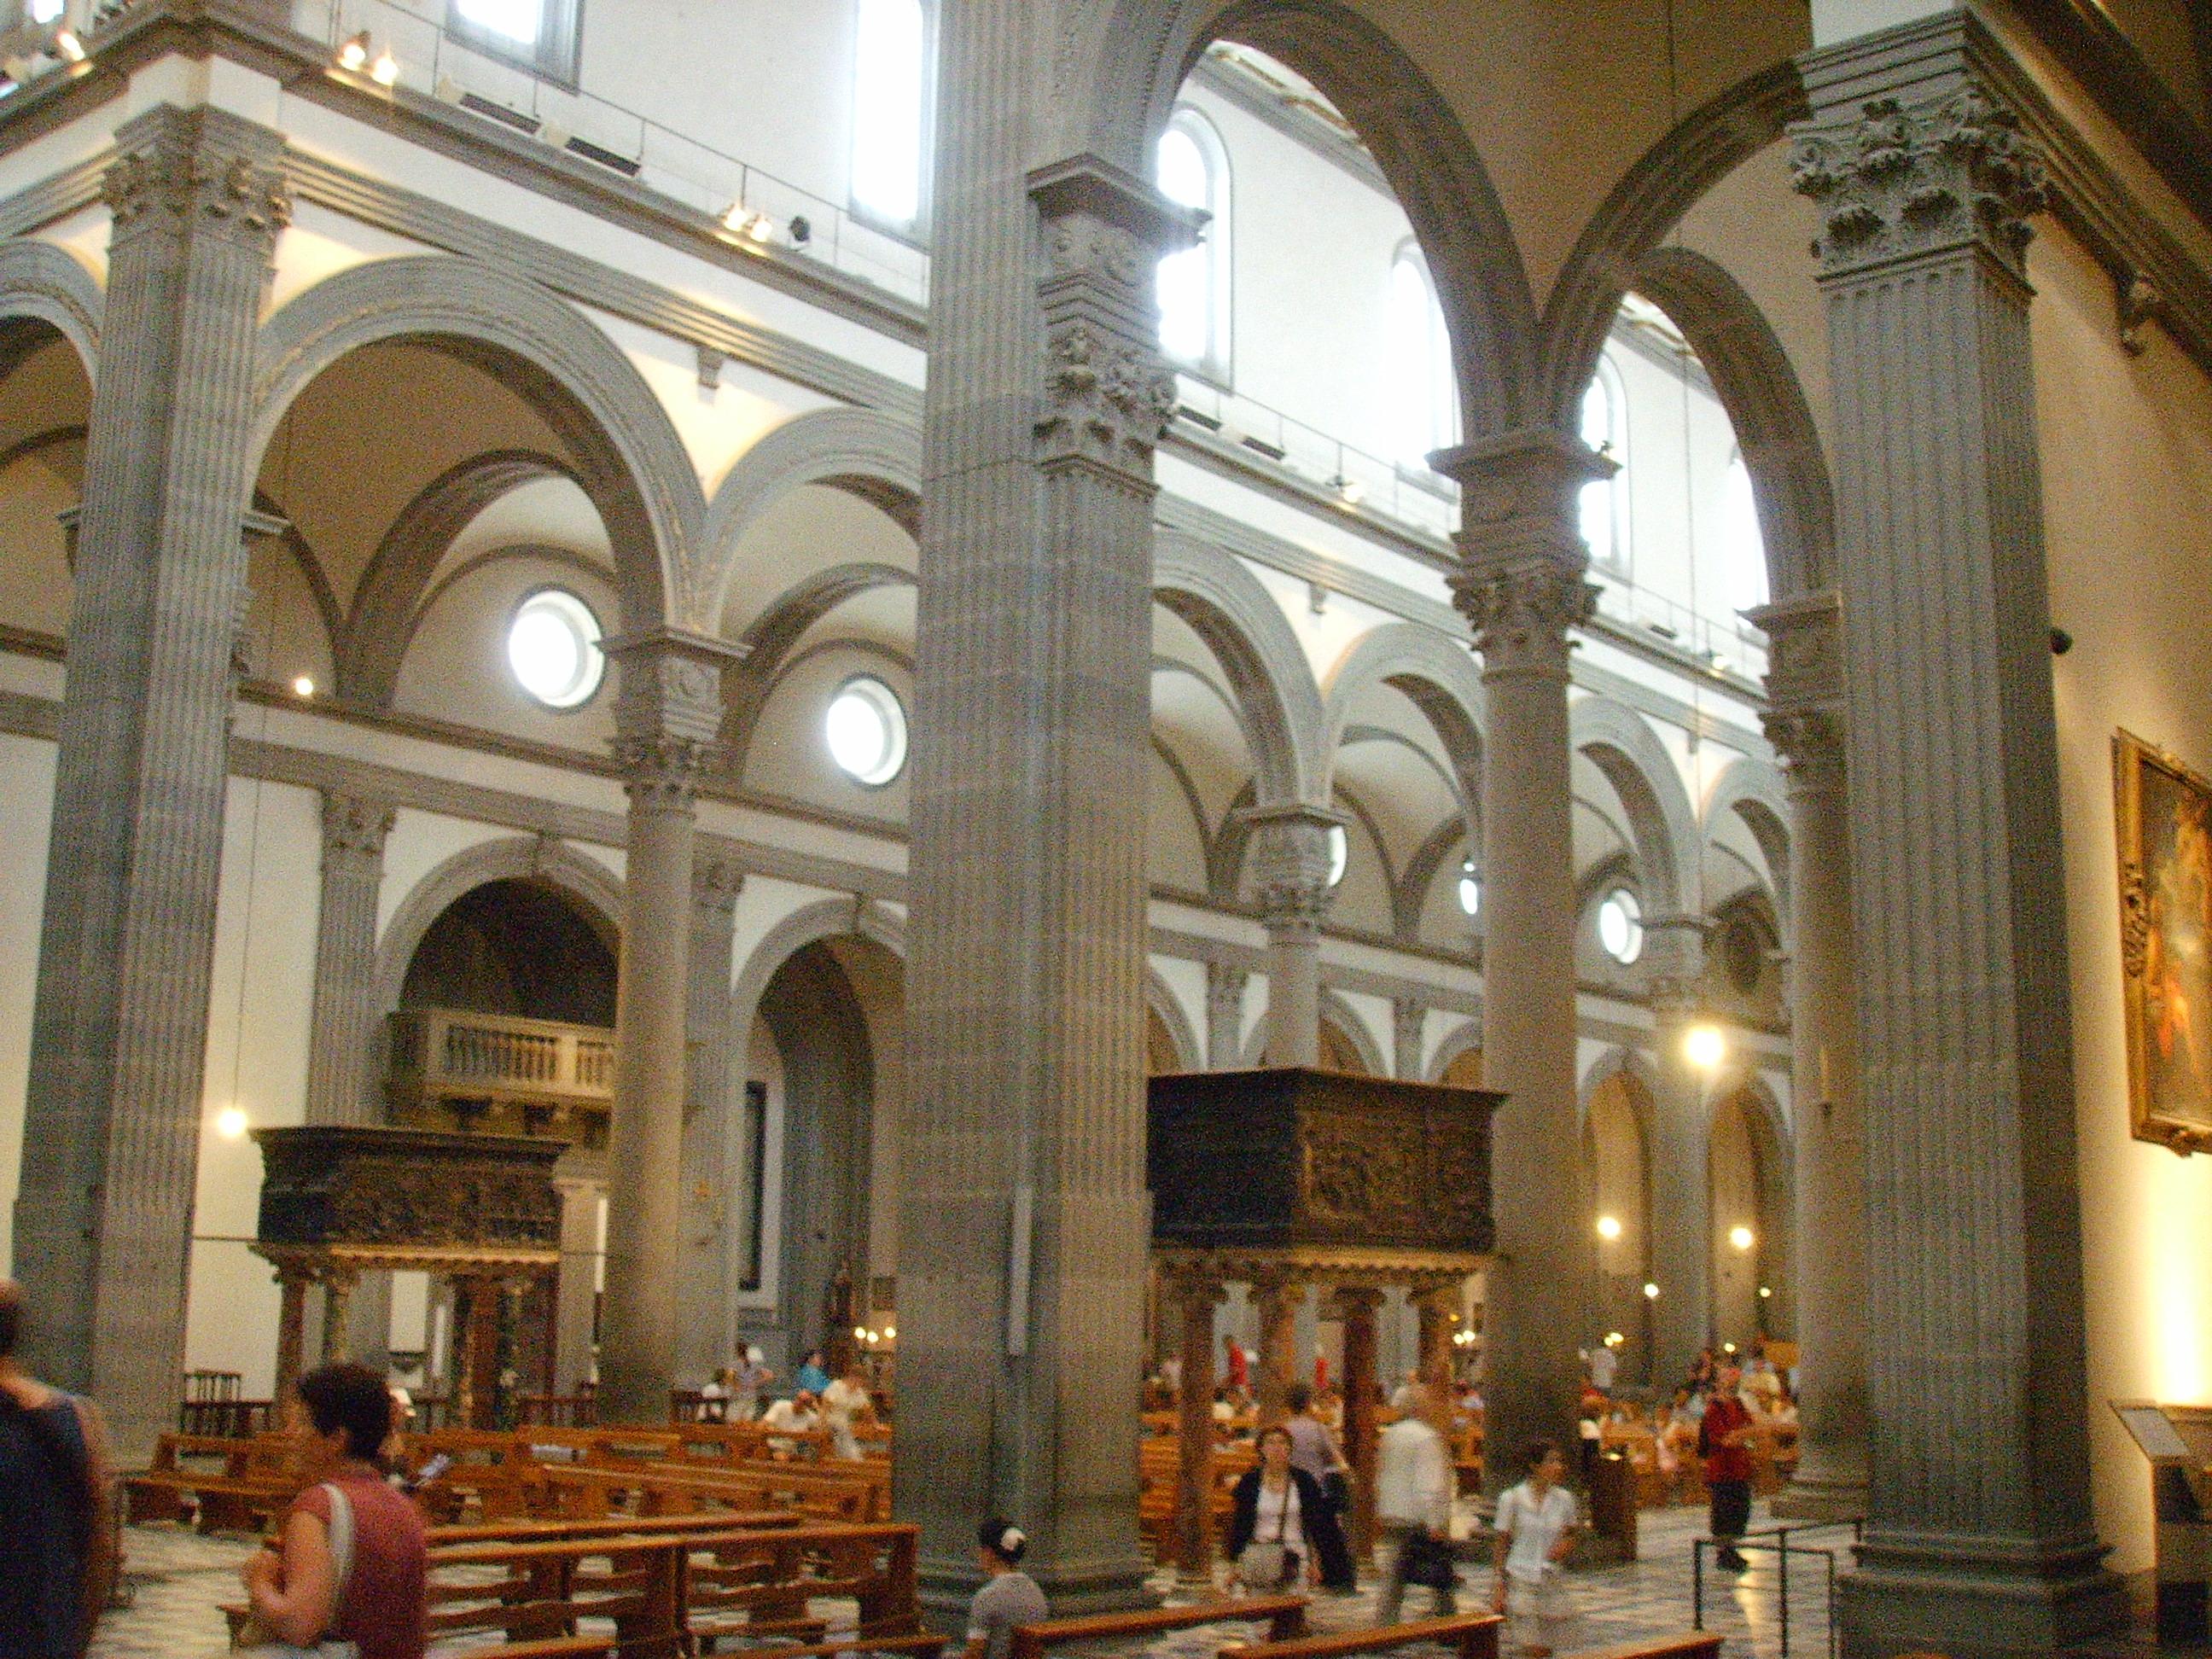 File:San Lorenzo, inside view.JPG - Wikimedia Commons